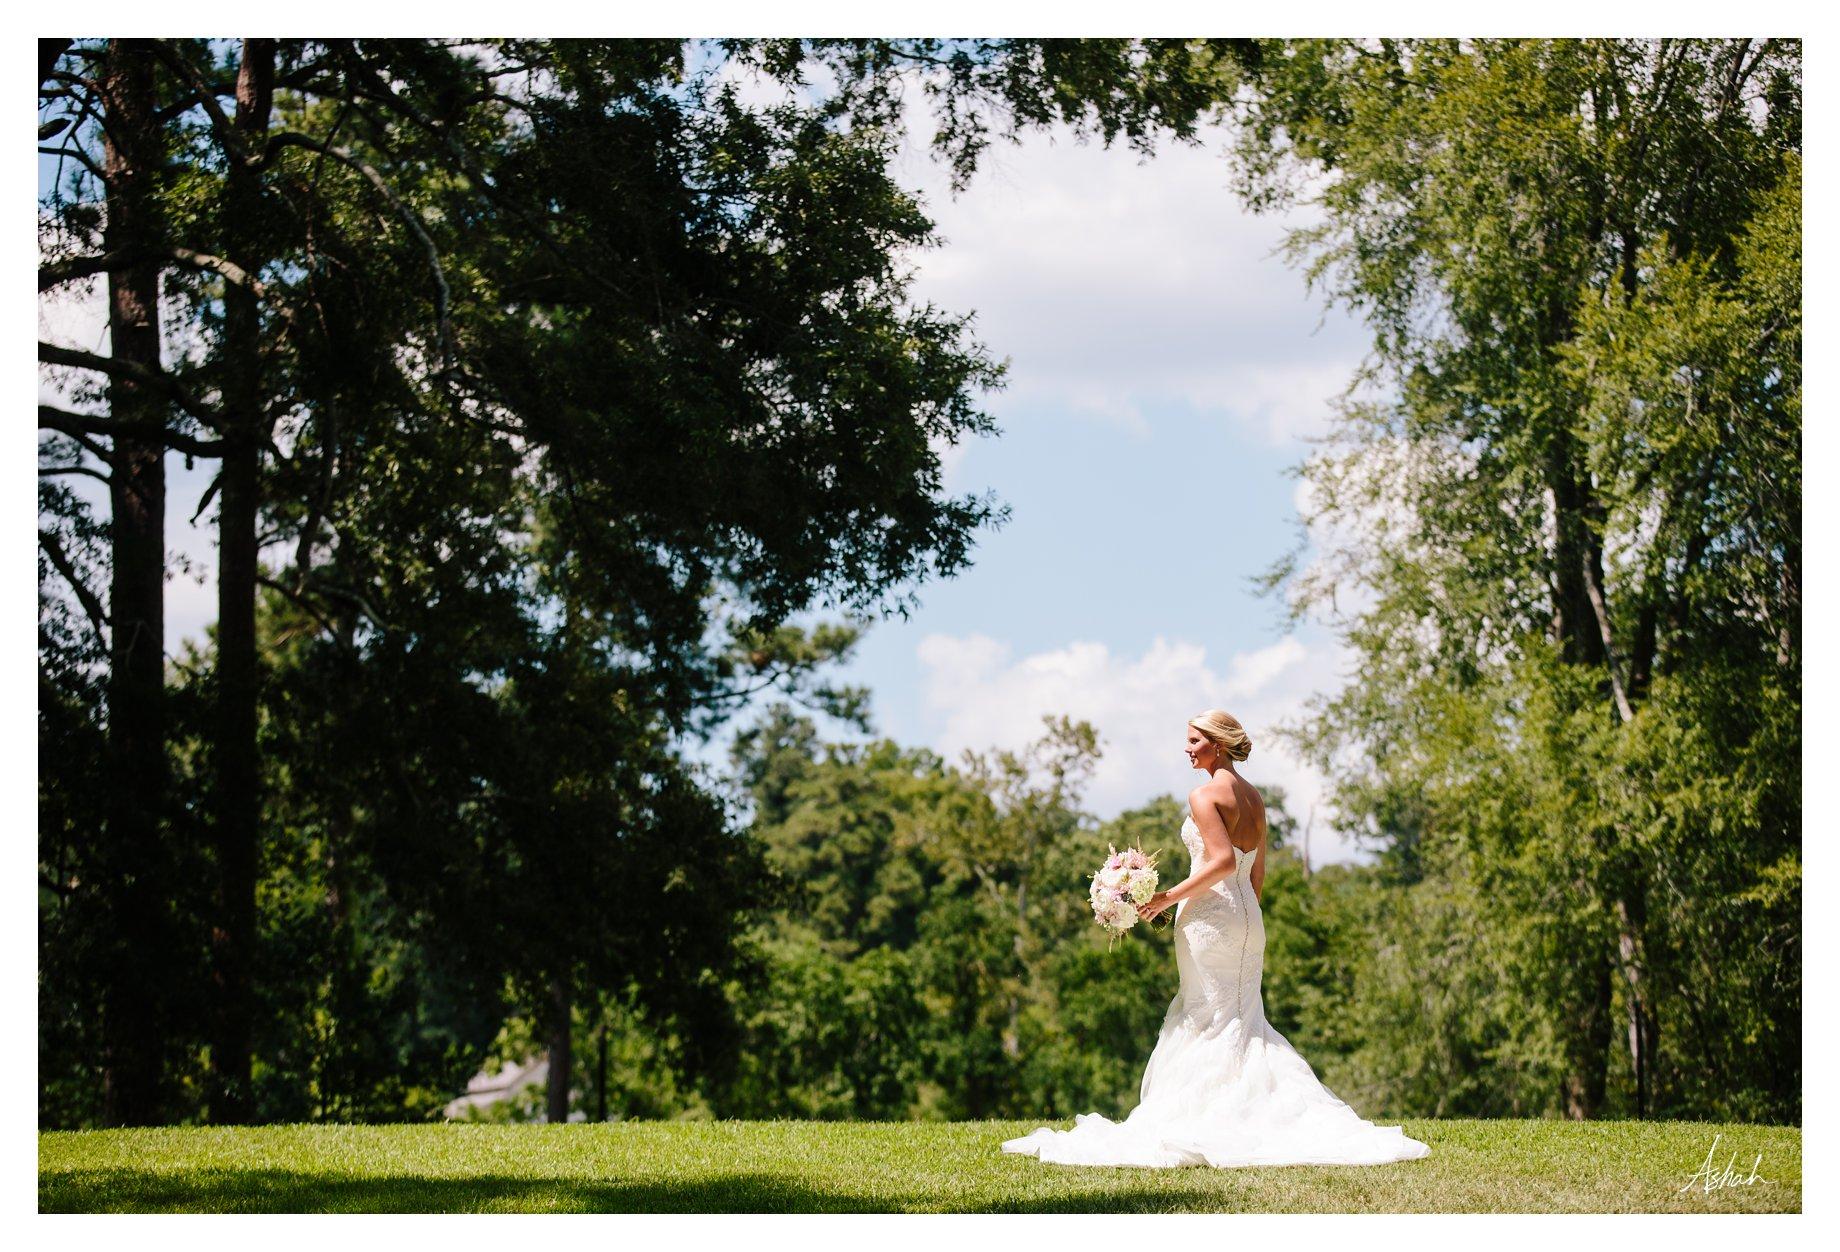 The Bride in Profile - Macon Wedding Photographer